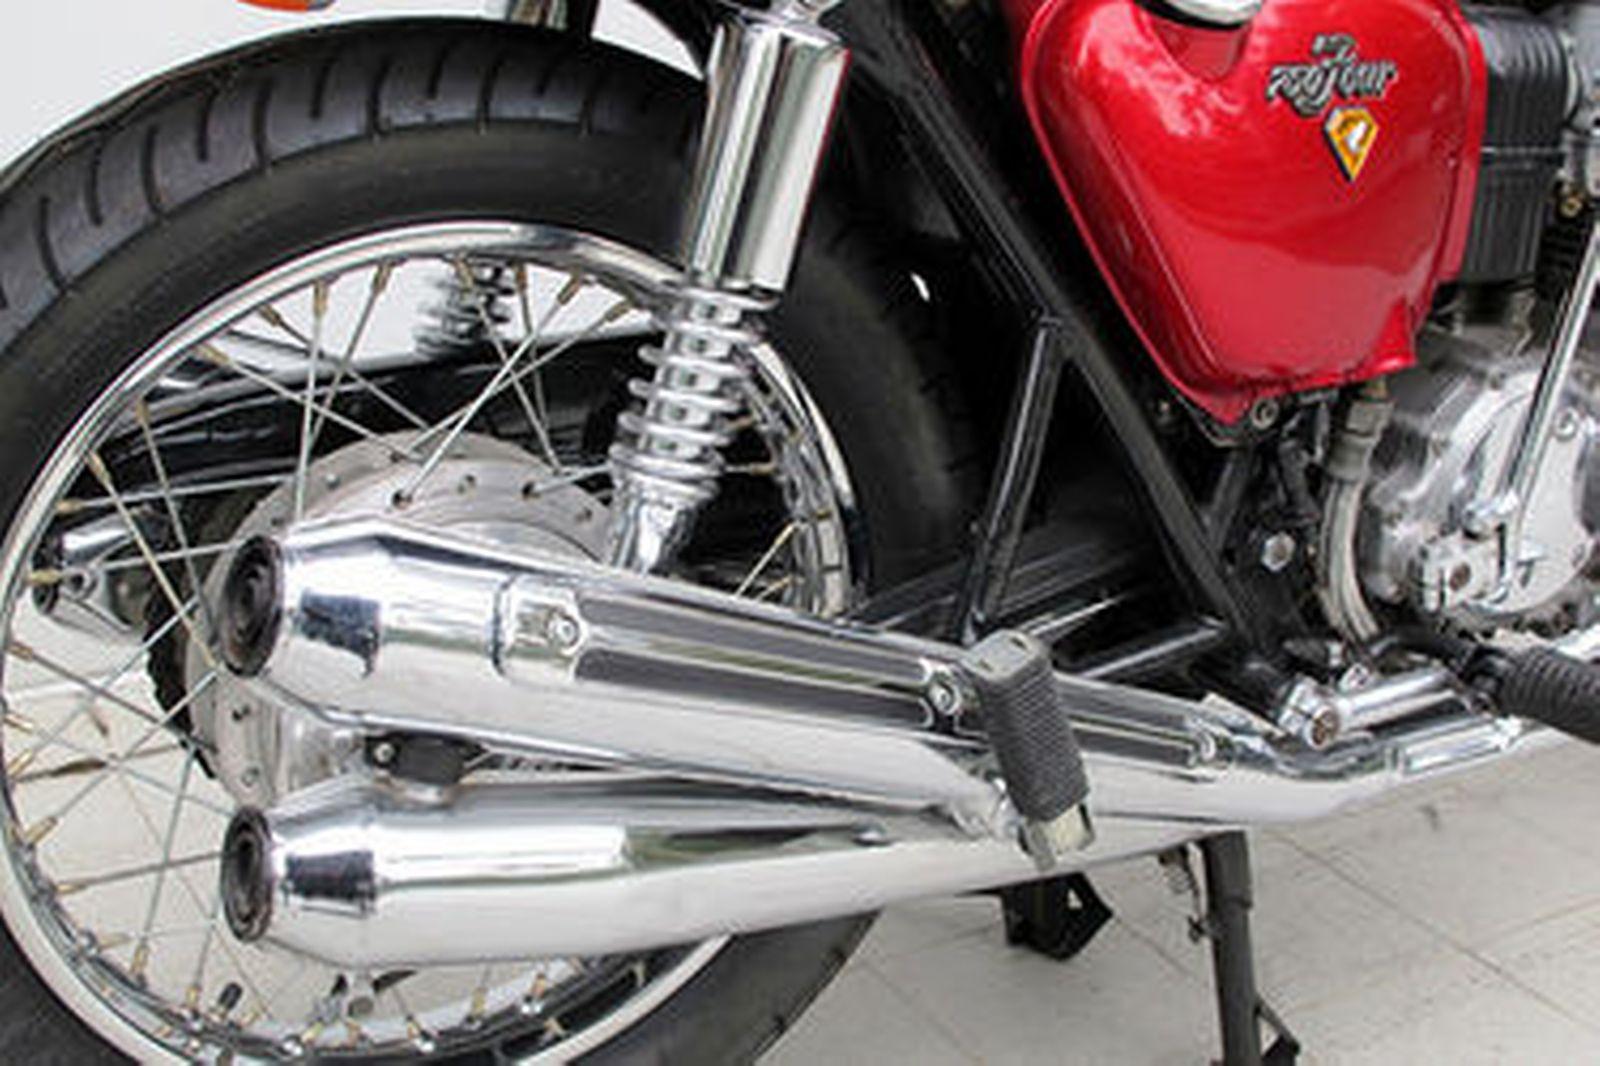 Honda CB750/4 K2 Motorcycle